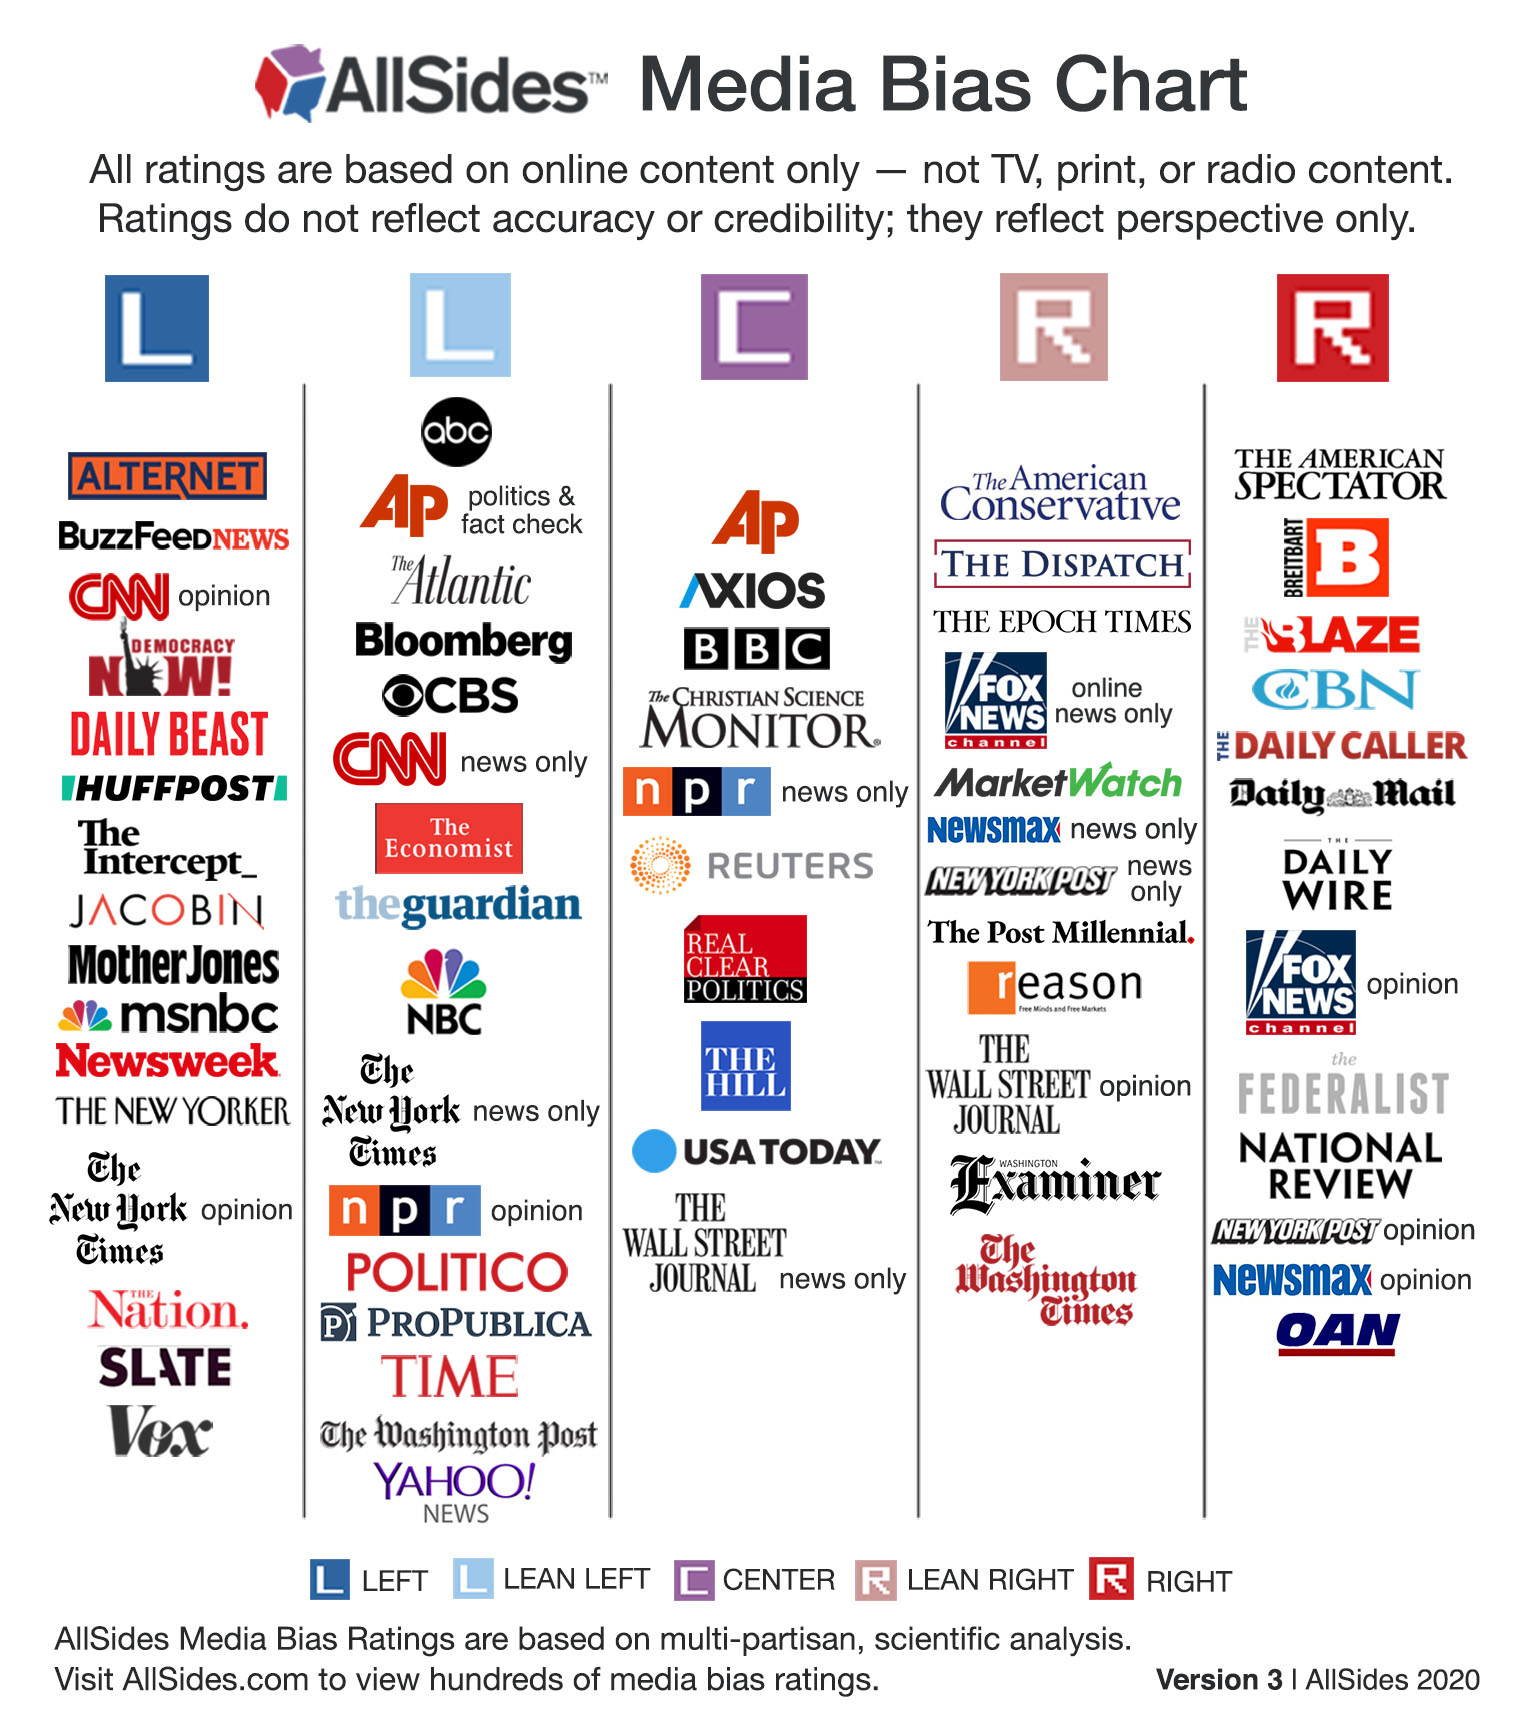 AllSides Media Bias Chart